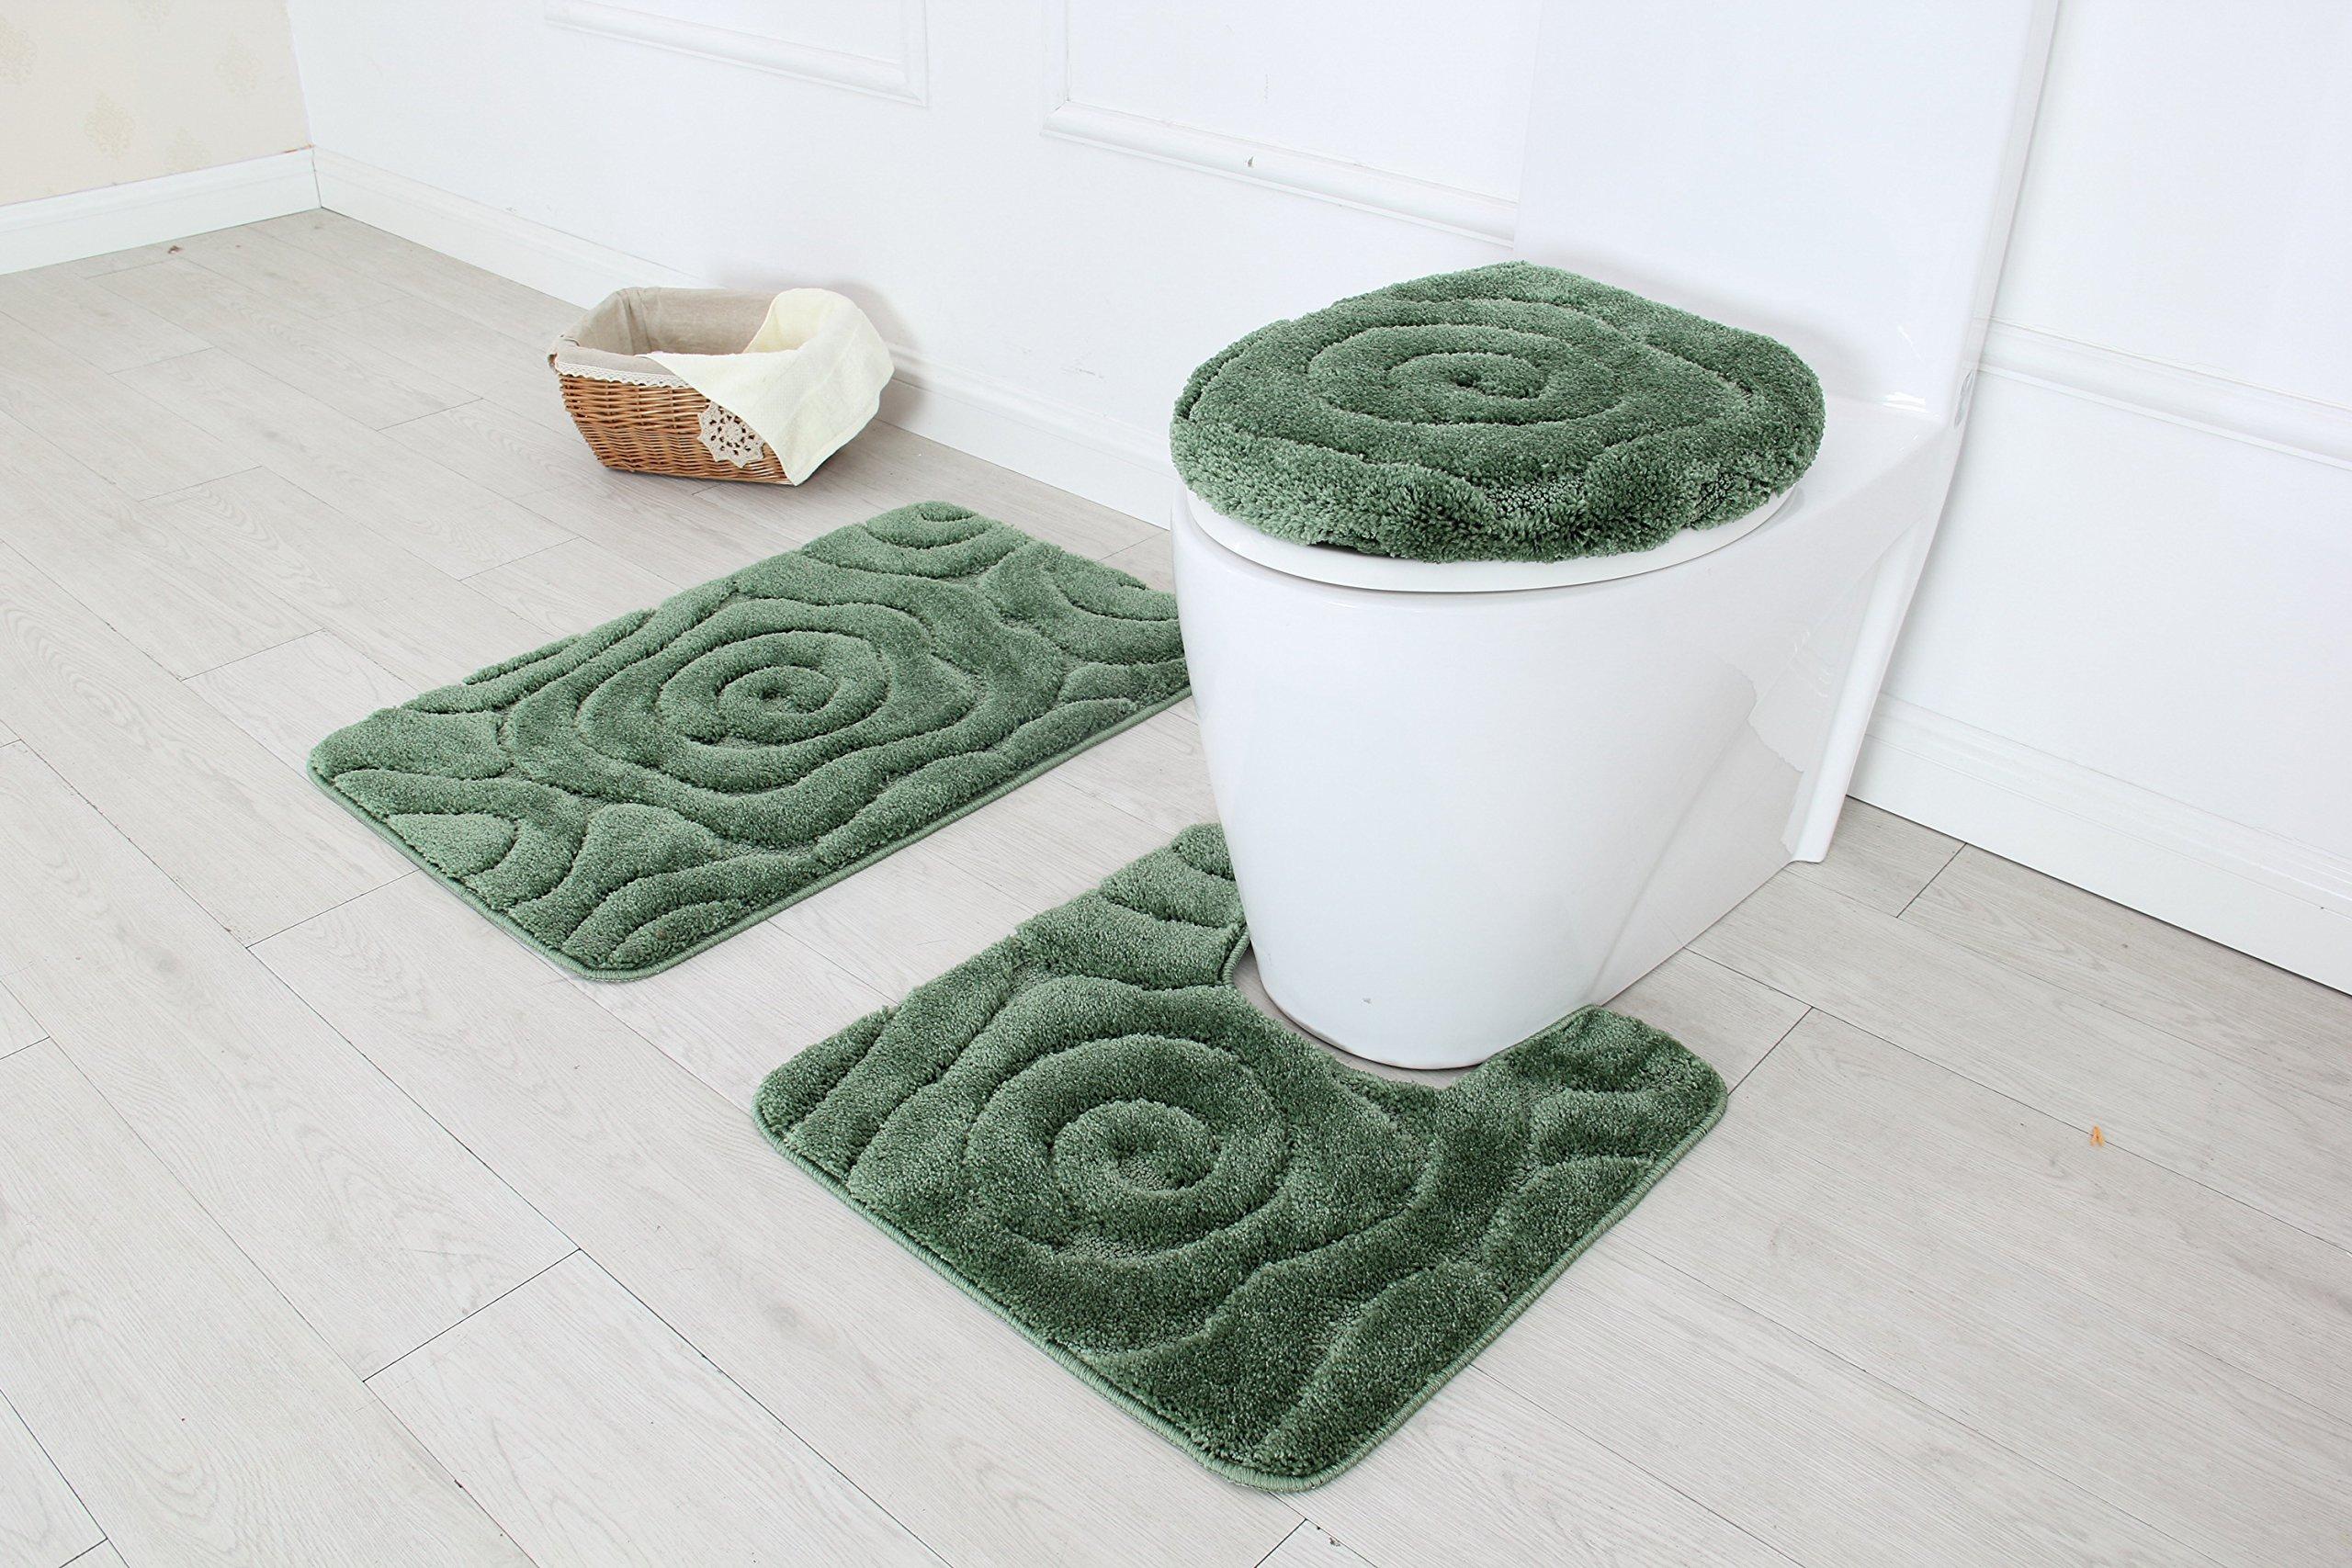 BH Home & Linen 3 Piece Luxurious Ultra Plush Prestige Bath Rug Set. Bath Rug 19.5'' x 30.5, Contour 20'' x 20. Made with 100% Polyester. (Sage)